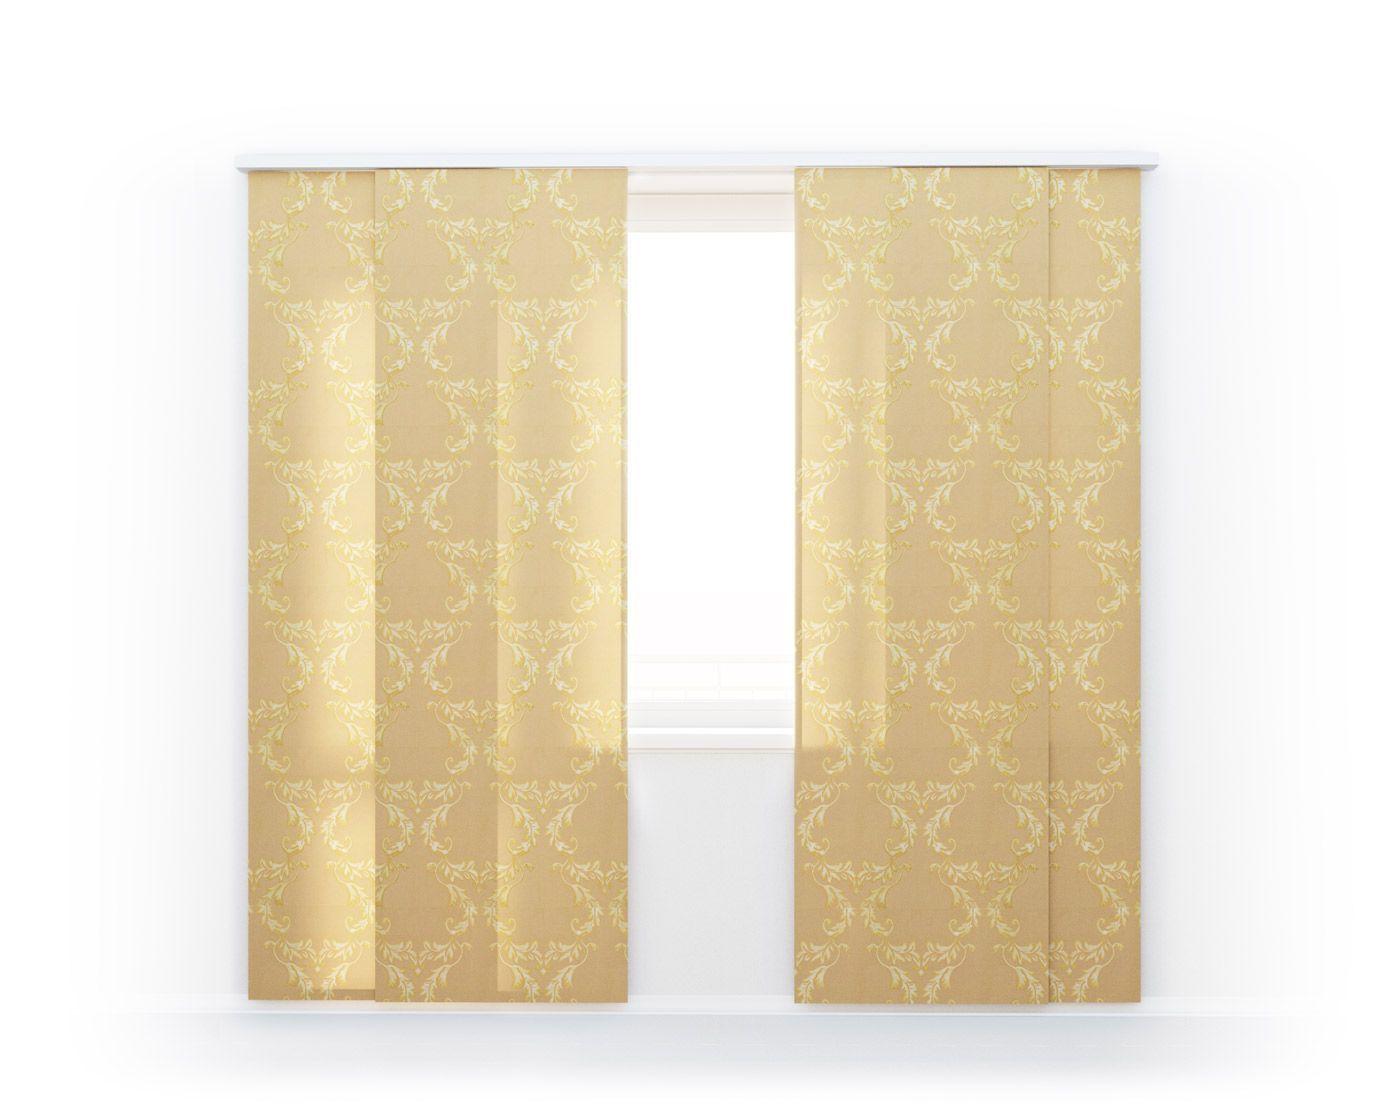 Японские шторы Louis D'or, 2375/28